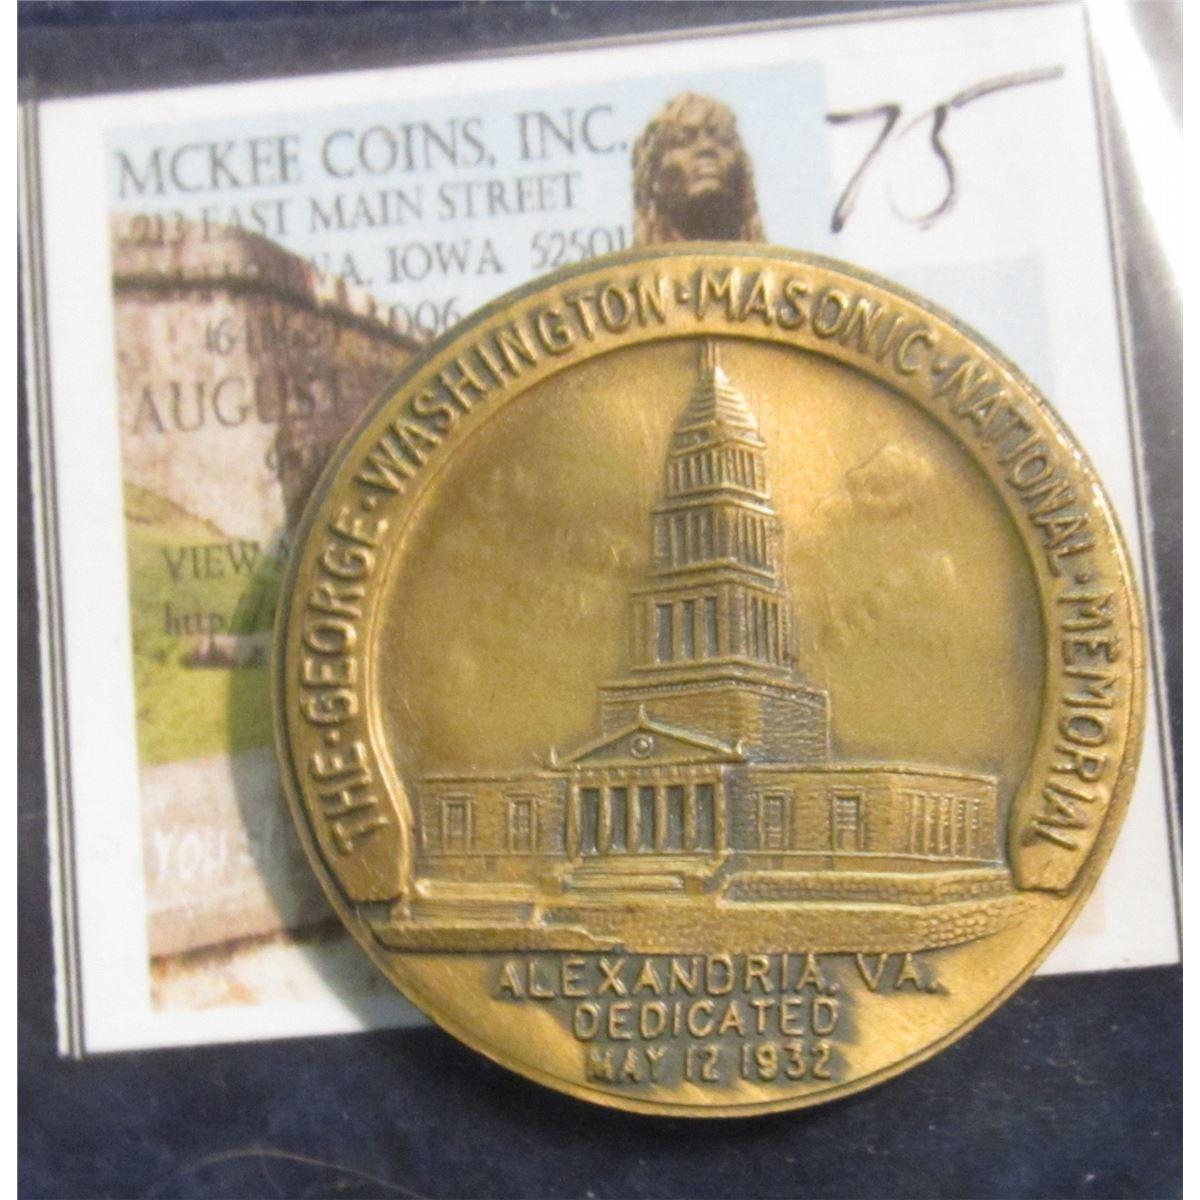 75 The George Washington Masonic National Memorial Alexandria Va Dedicated May 12 1932 Rever